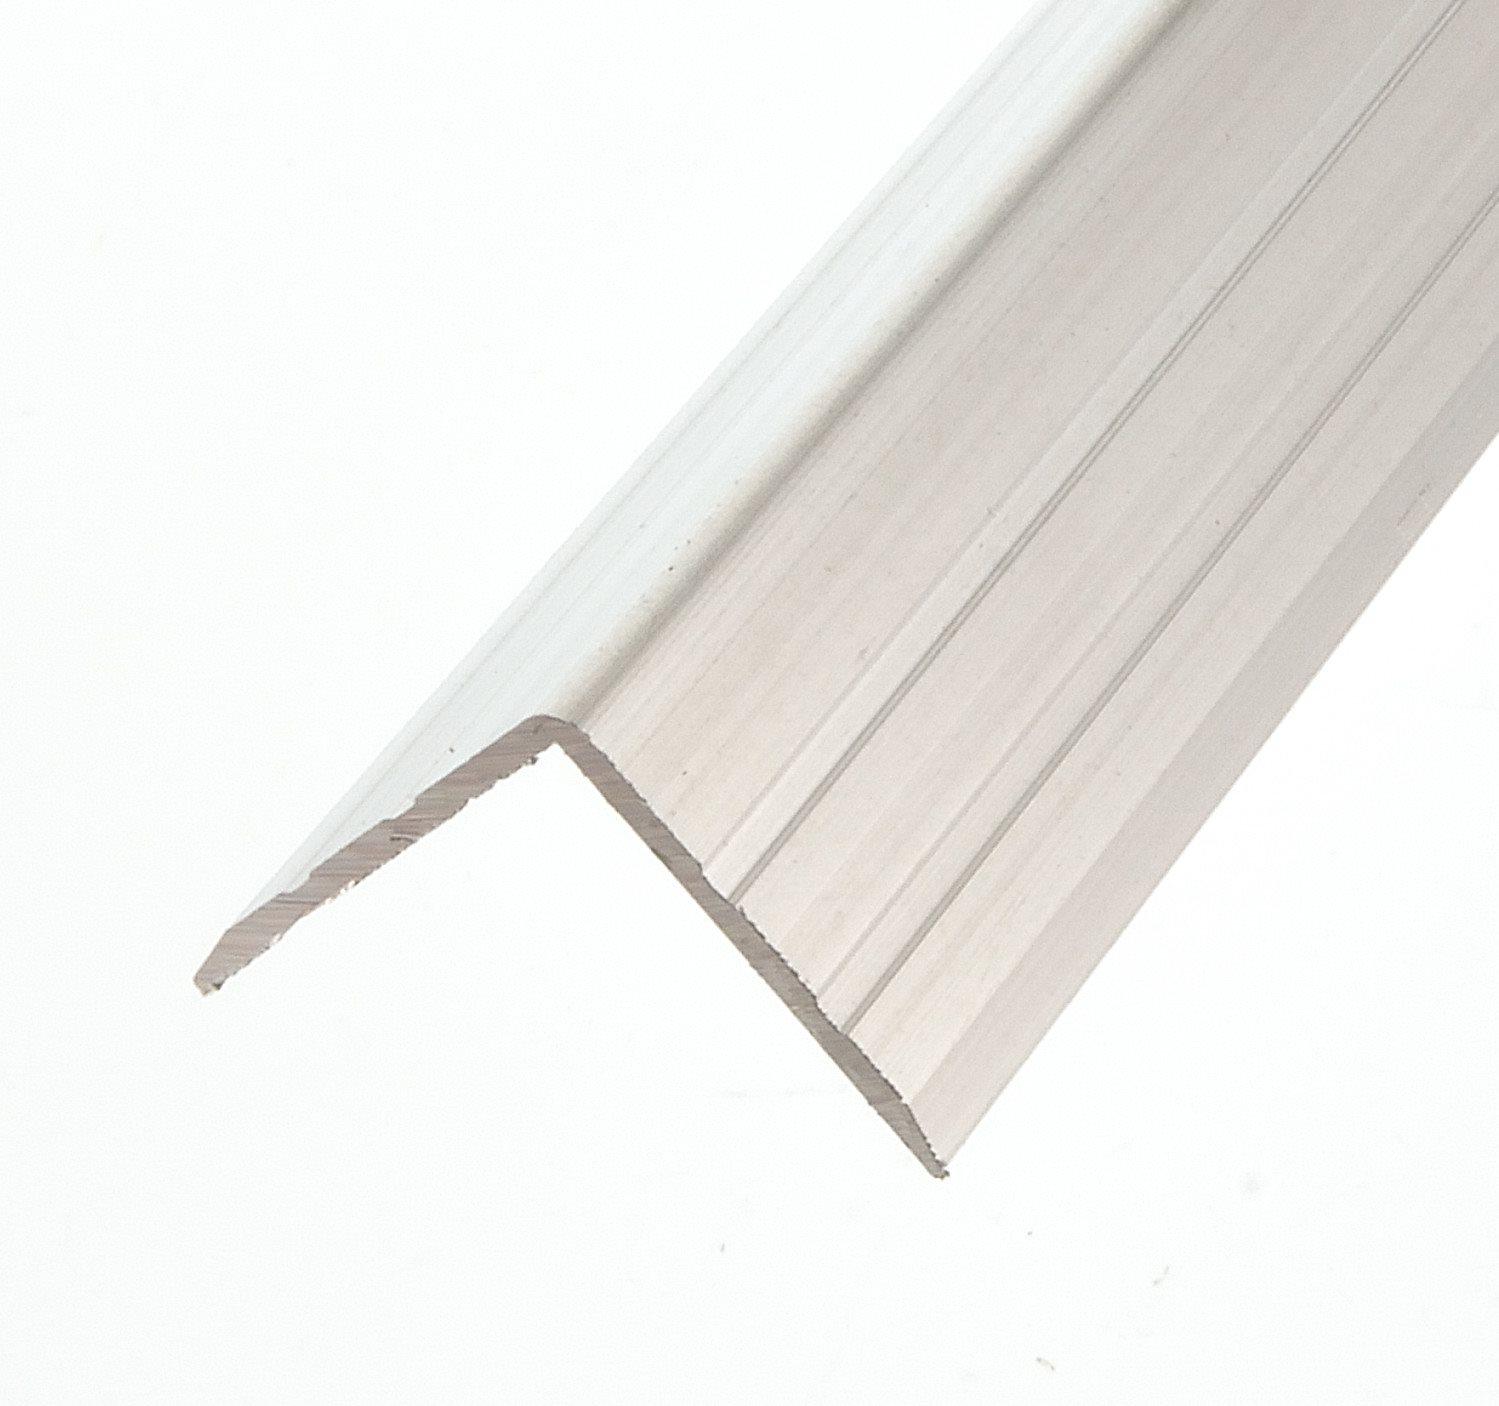 kantenschutz 25x25x1 5 mm aluminium winkelprofil 13881. Black Bedroom Furniture Sets. Home Design Ideas